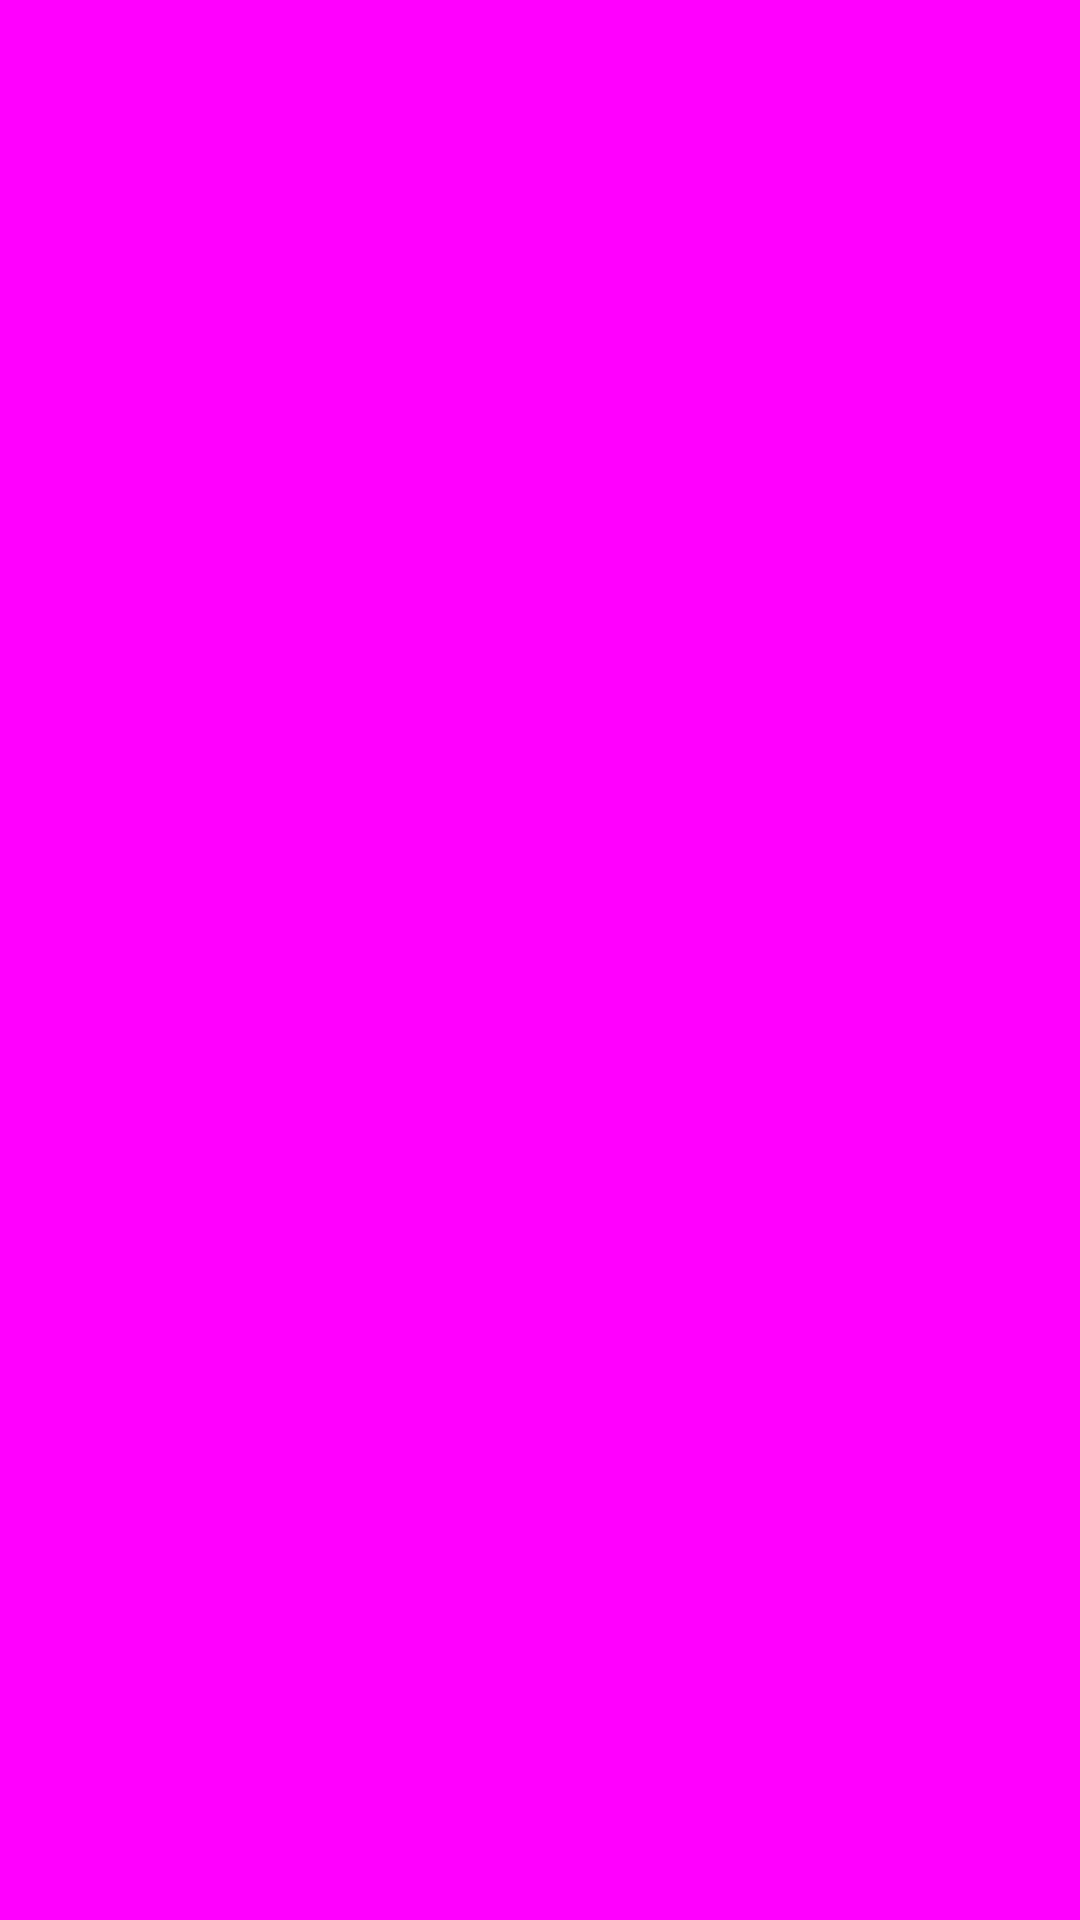 1080x1920 Magenta Solid Color Background